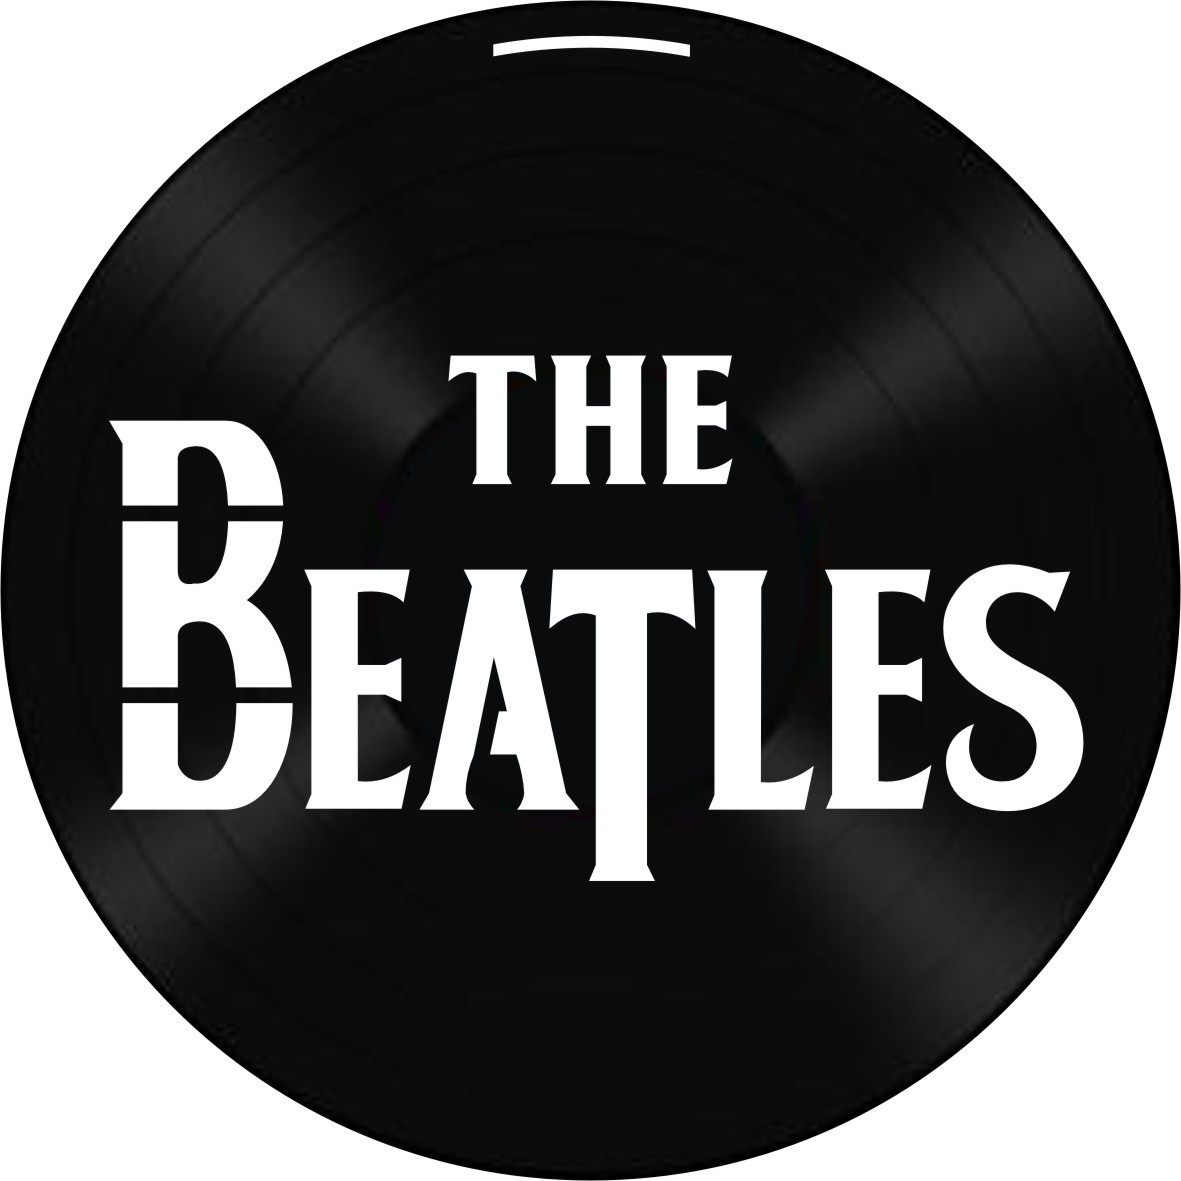 Disco de Vinil Decorativo The Beatles